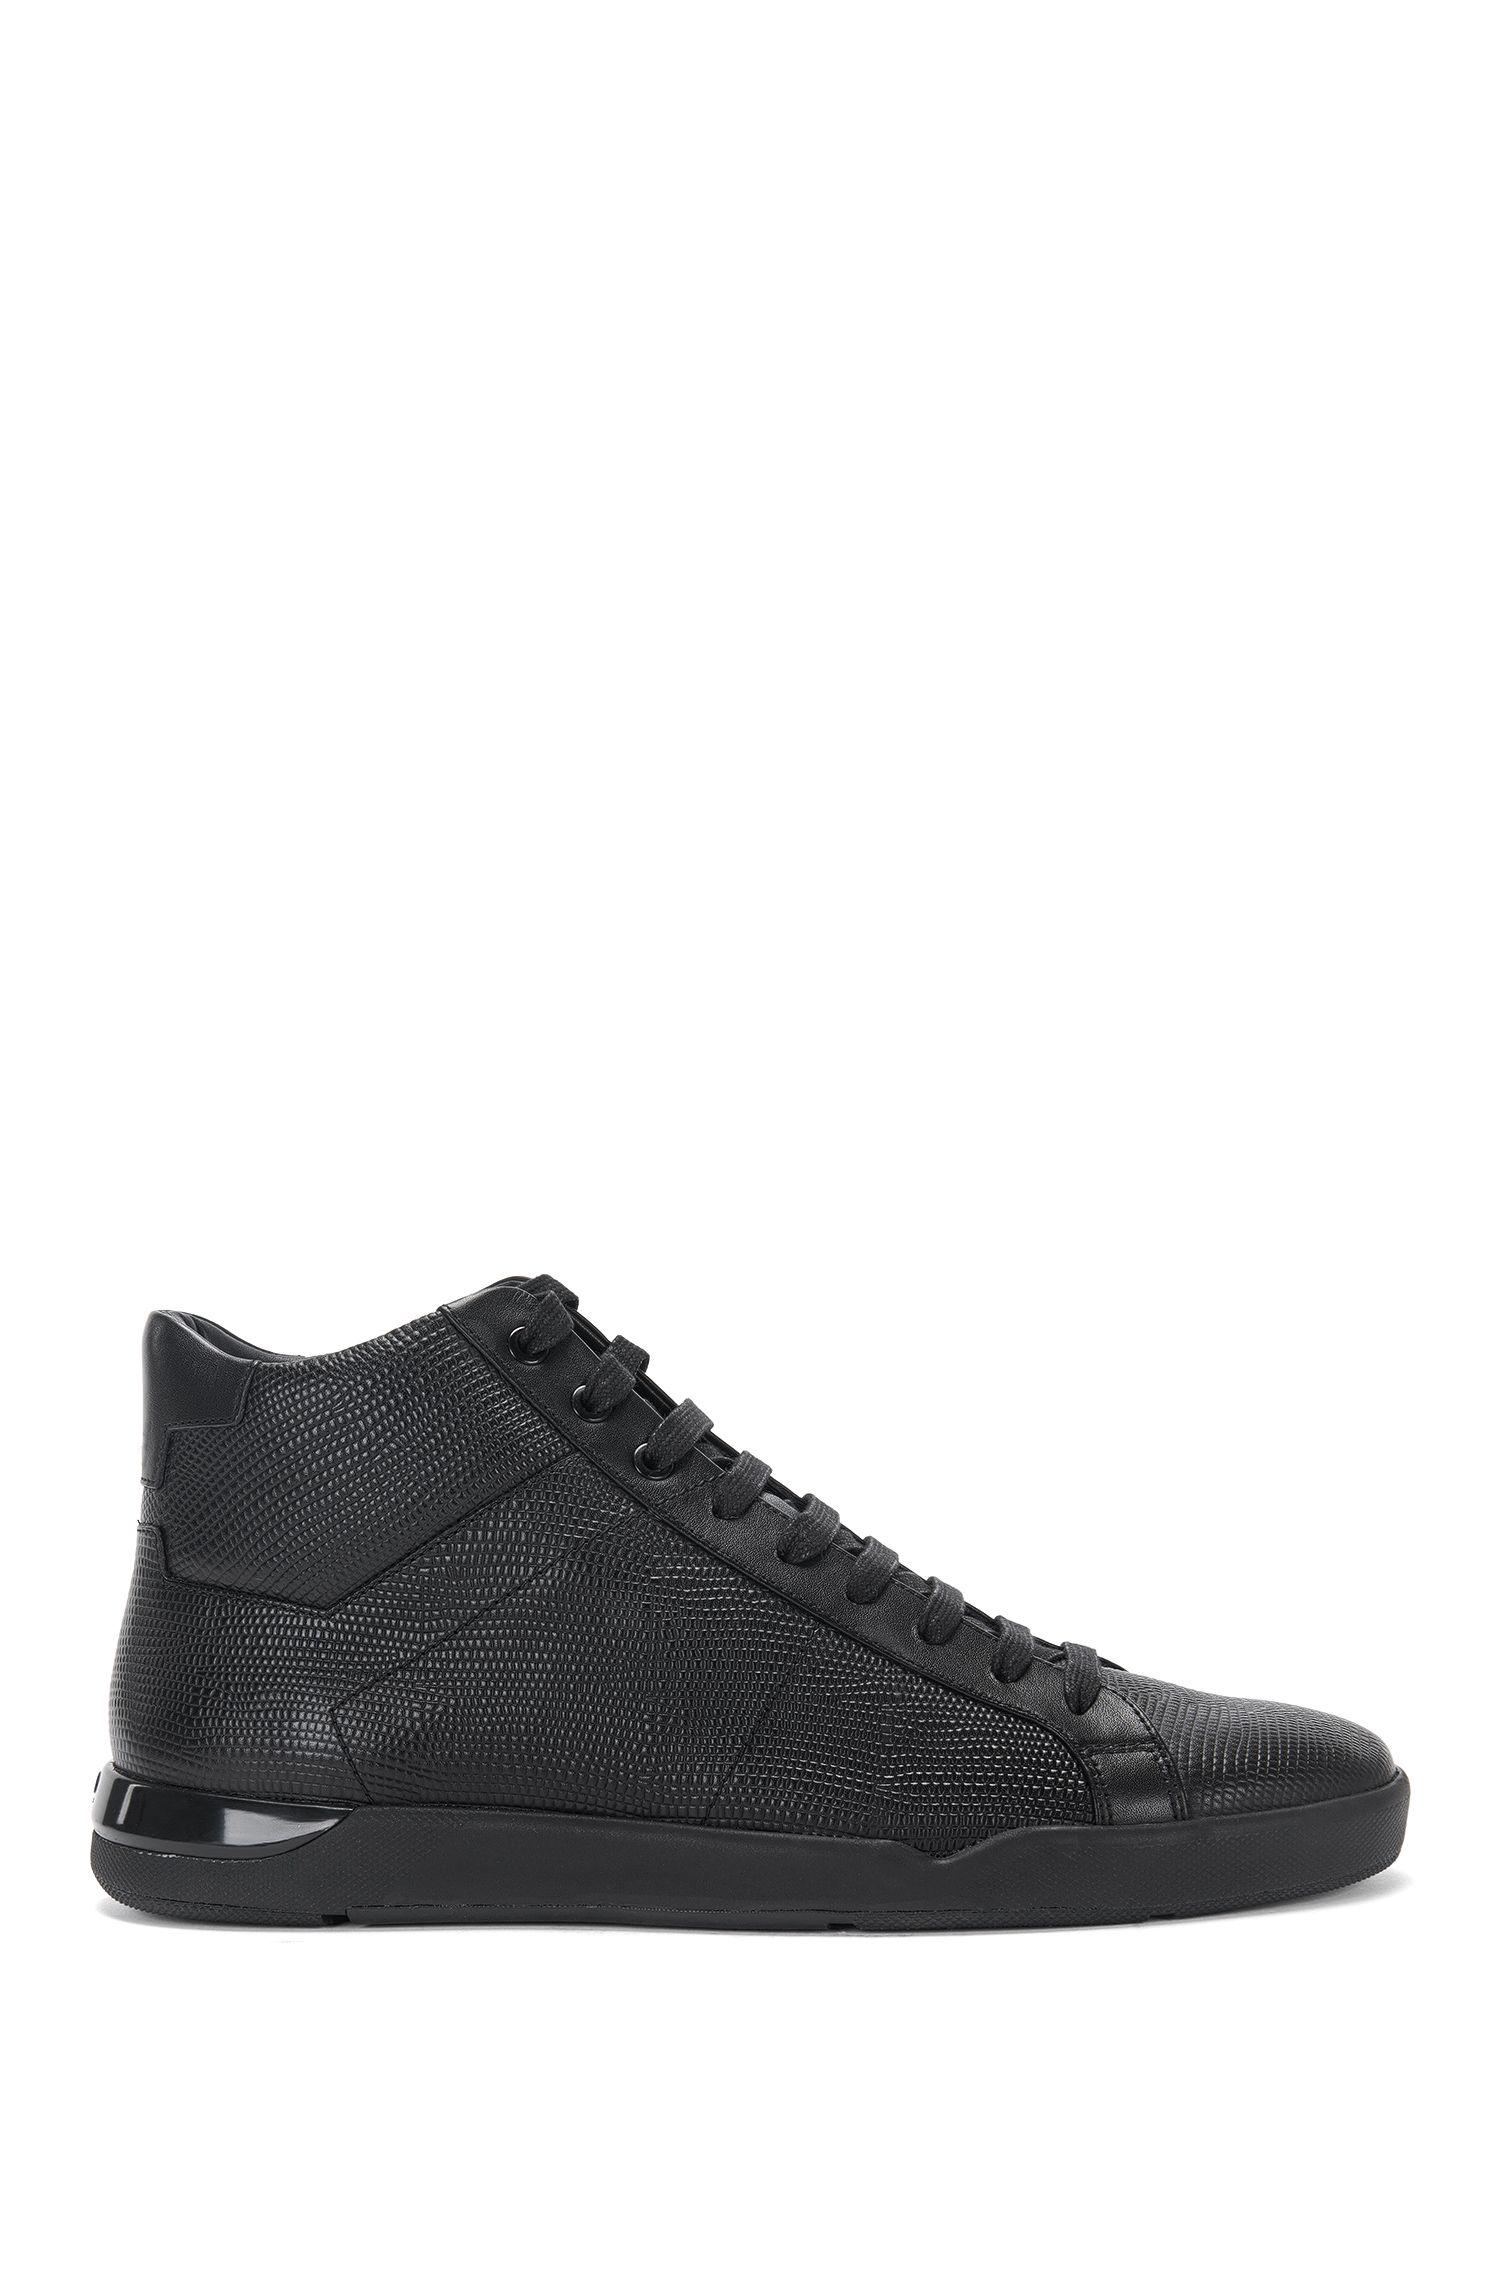 High-Top Sneakers aus Leder mit Prägung : 'Fusion_Hito_Itexo'